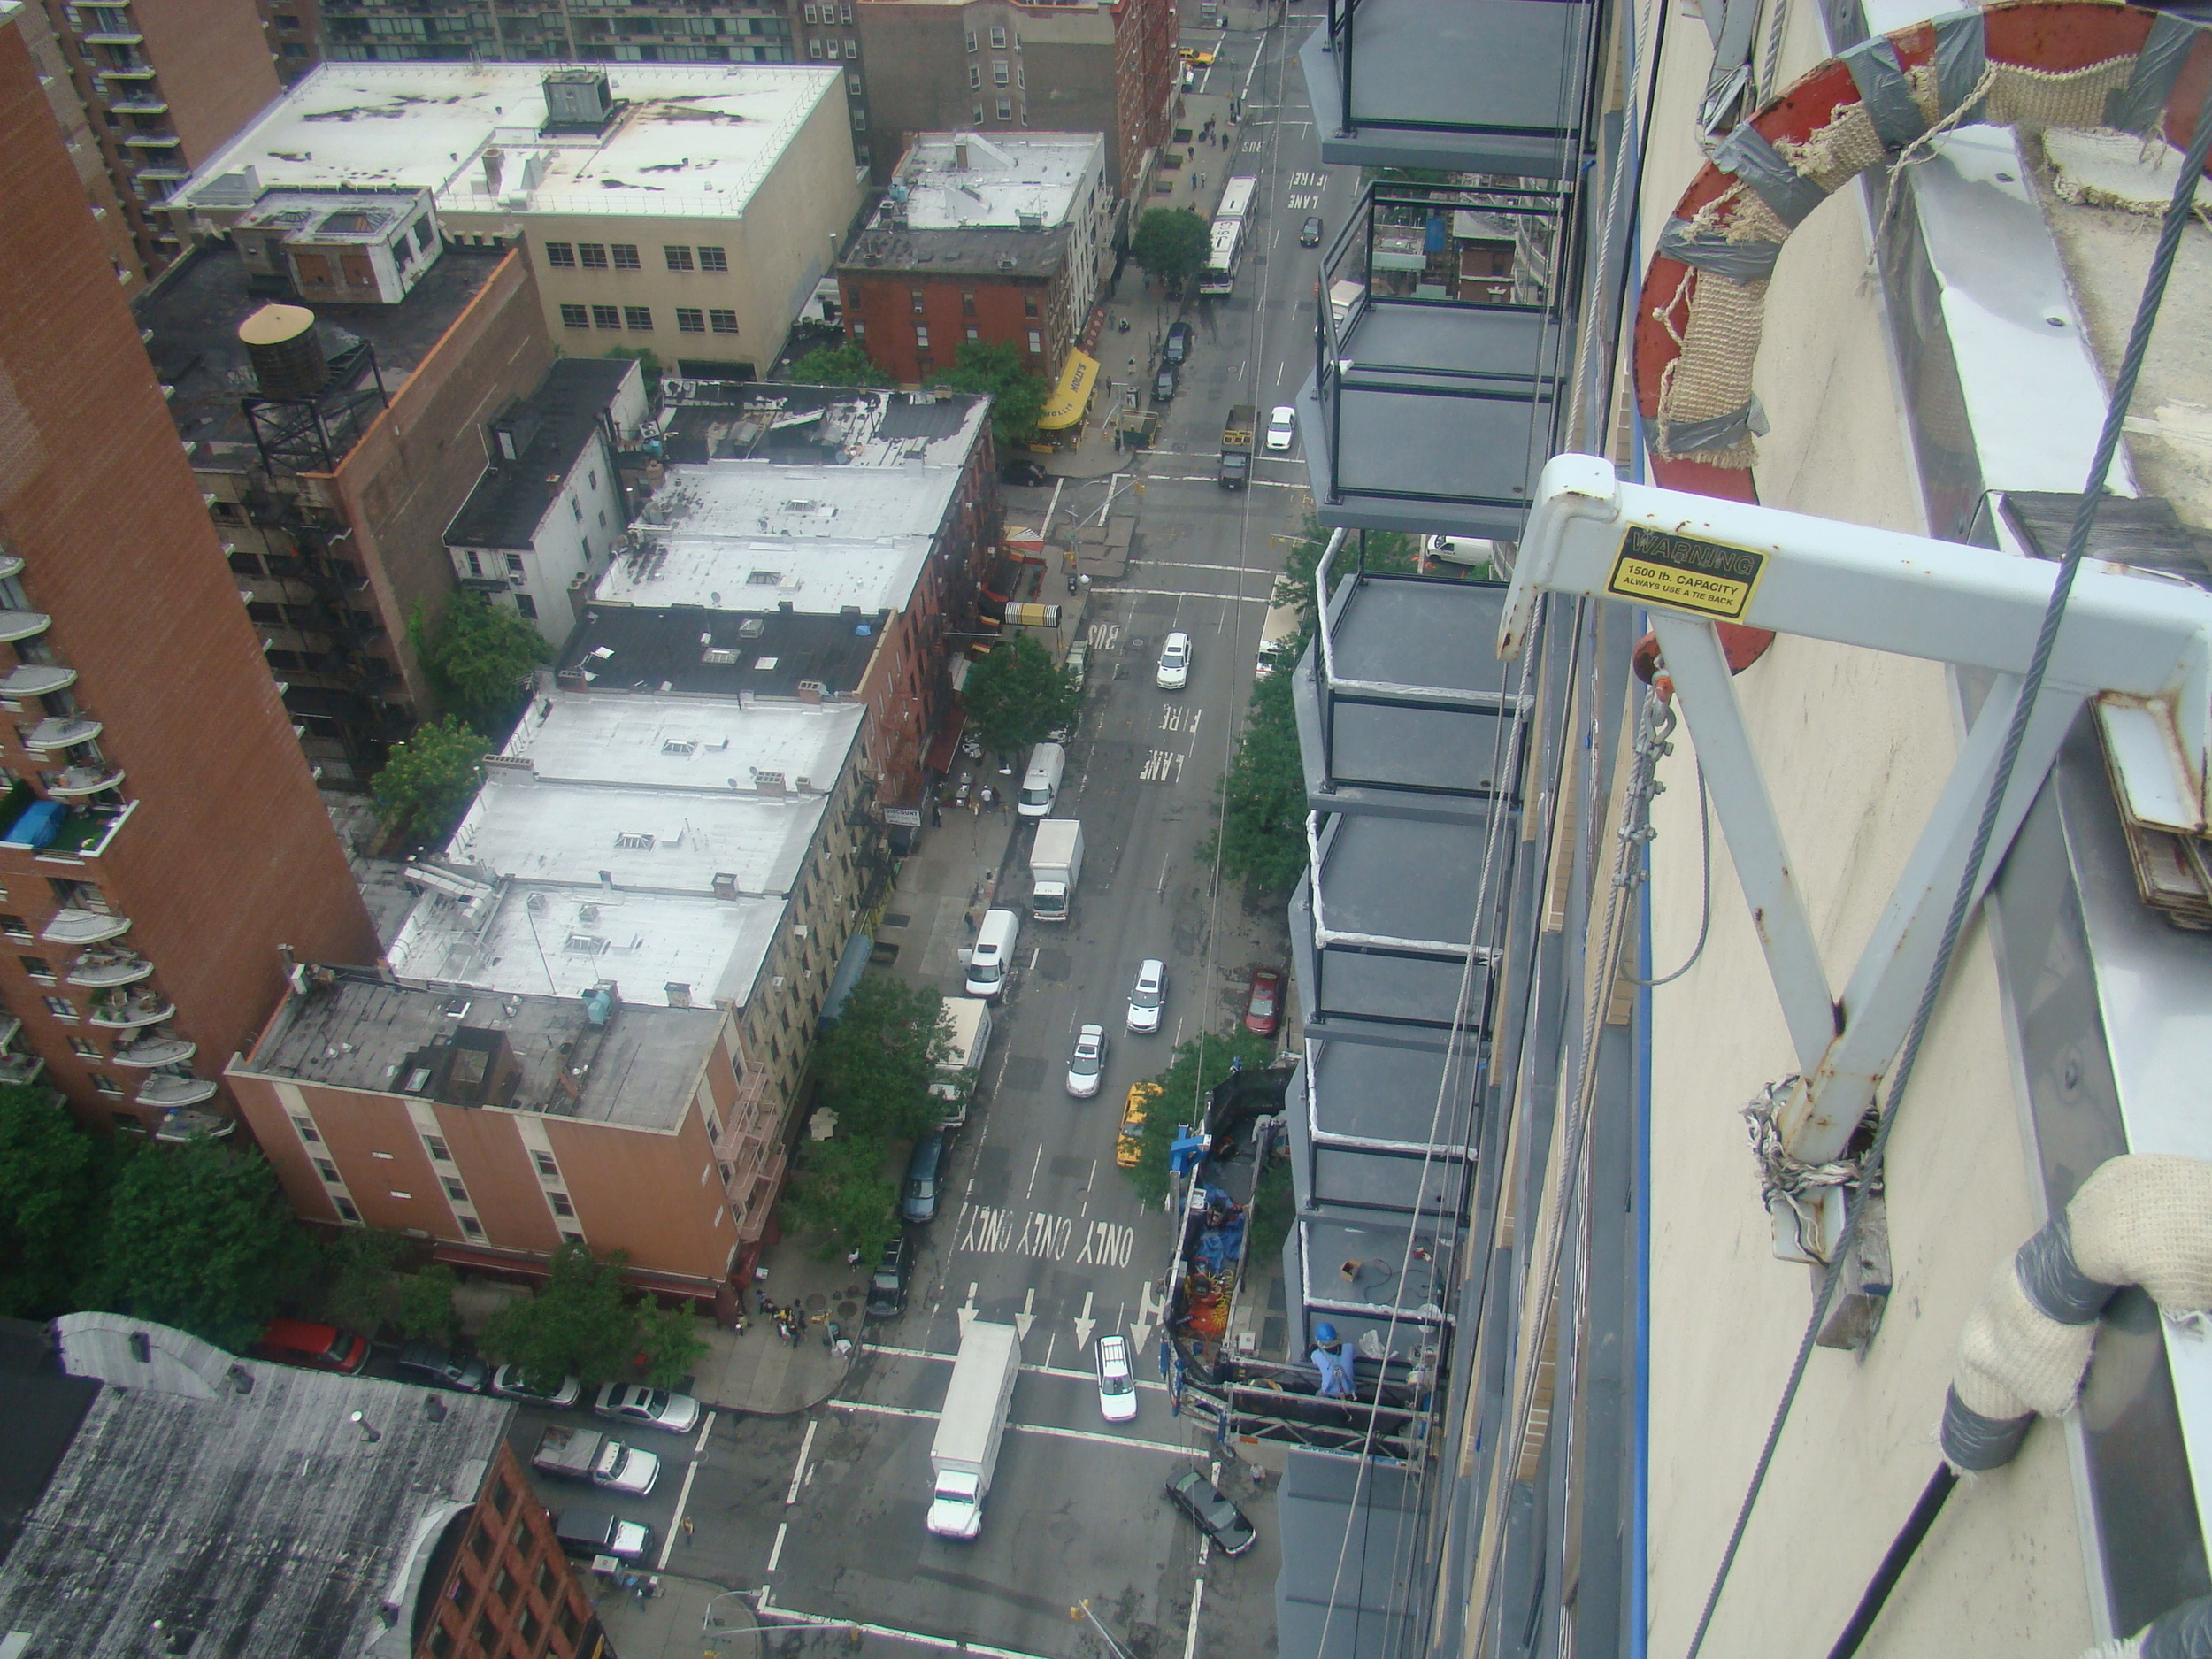 83 street new balconies 022.jpg